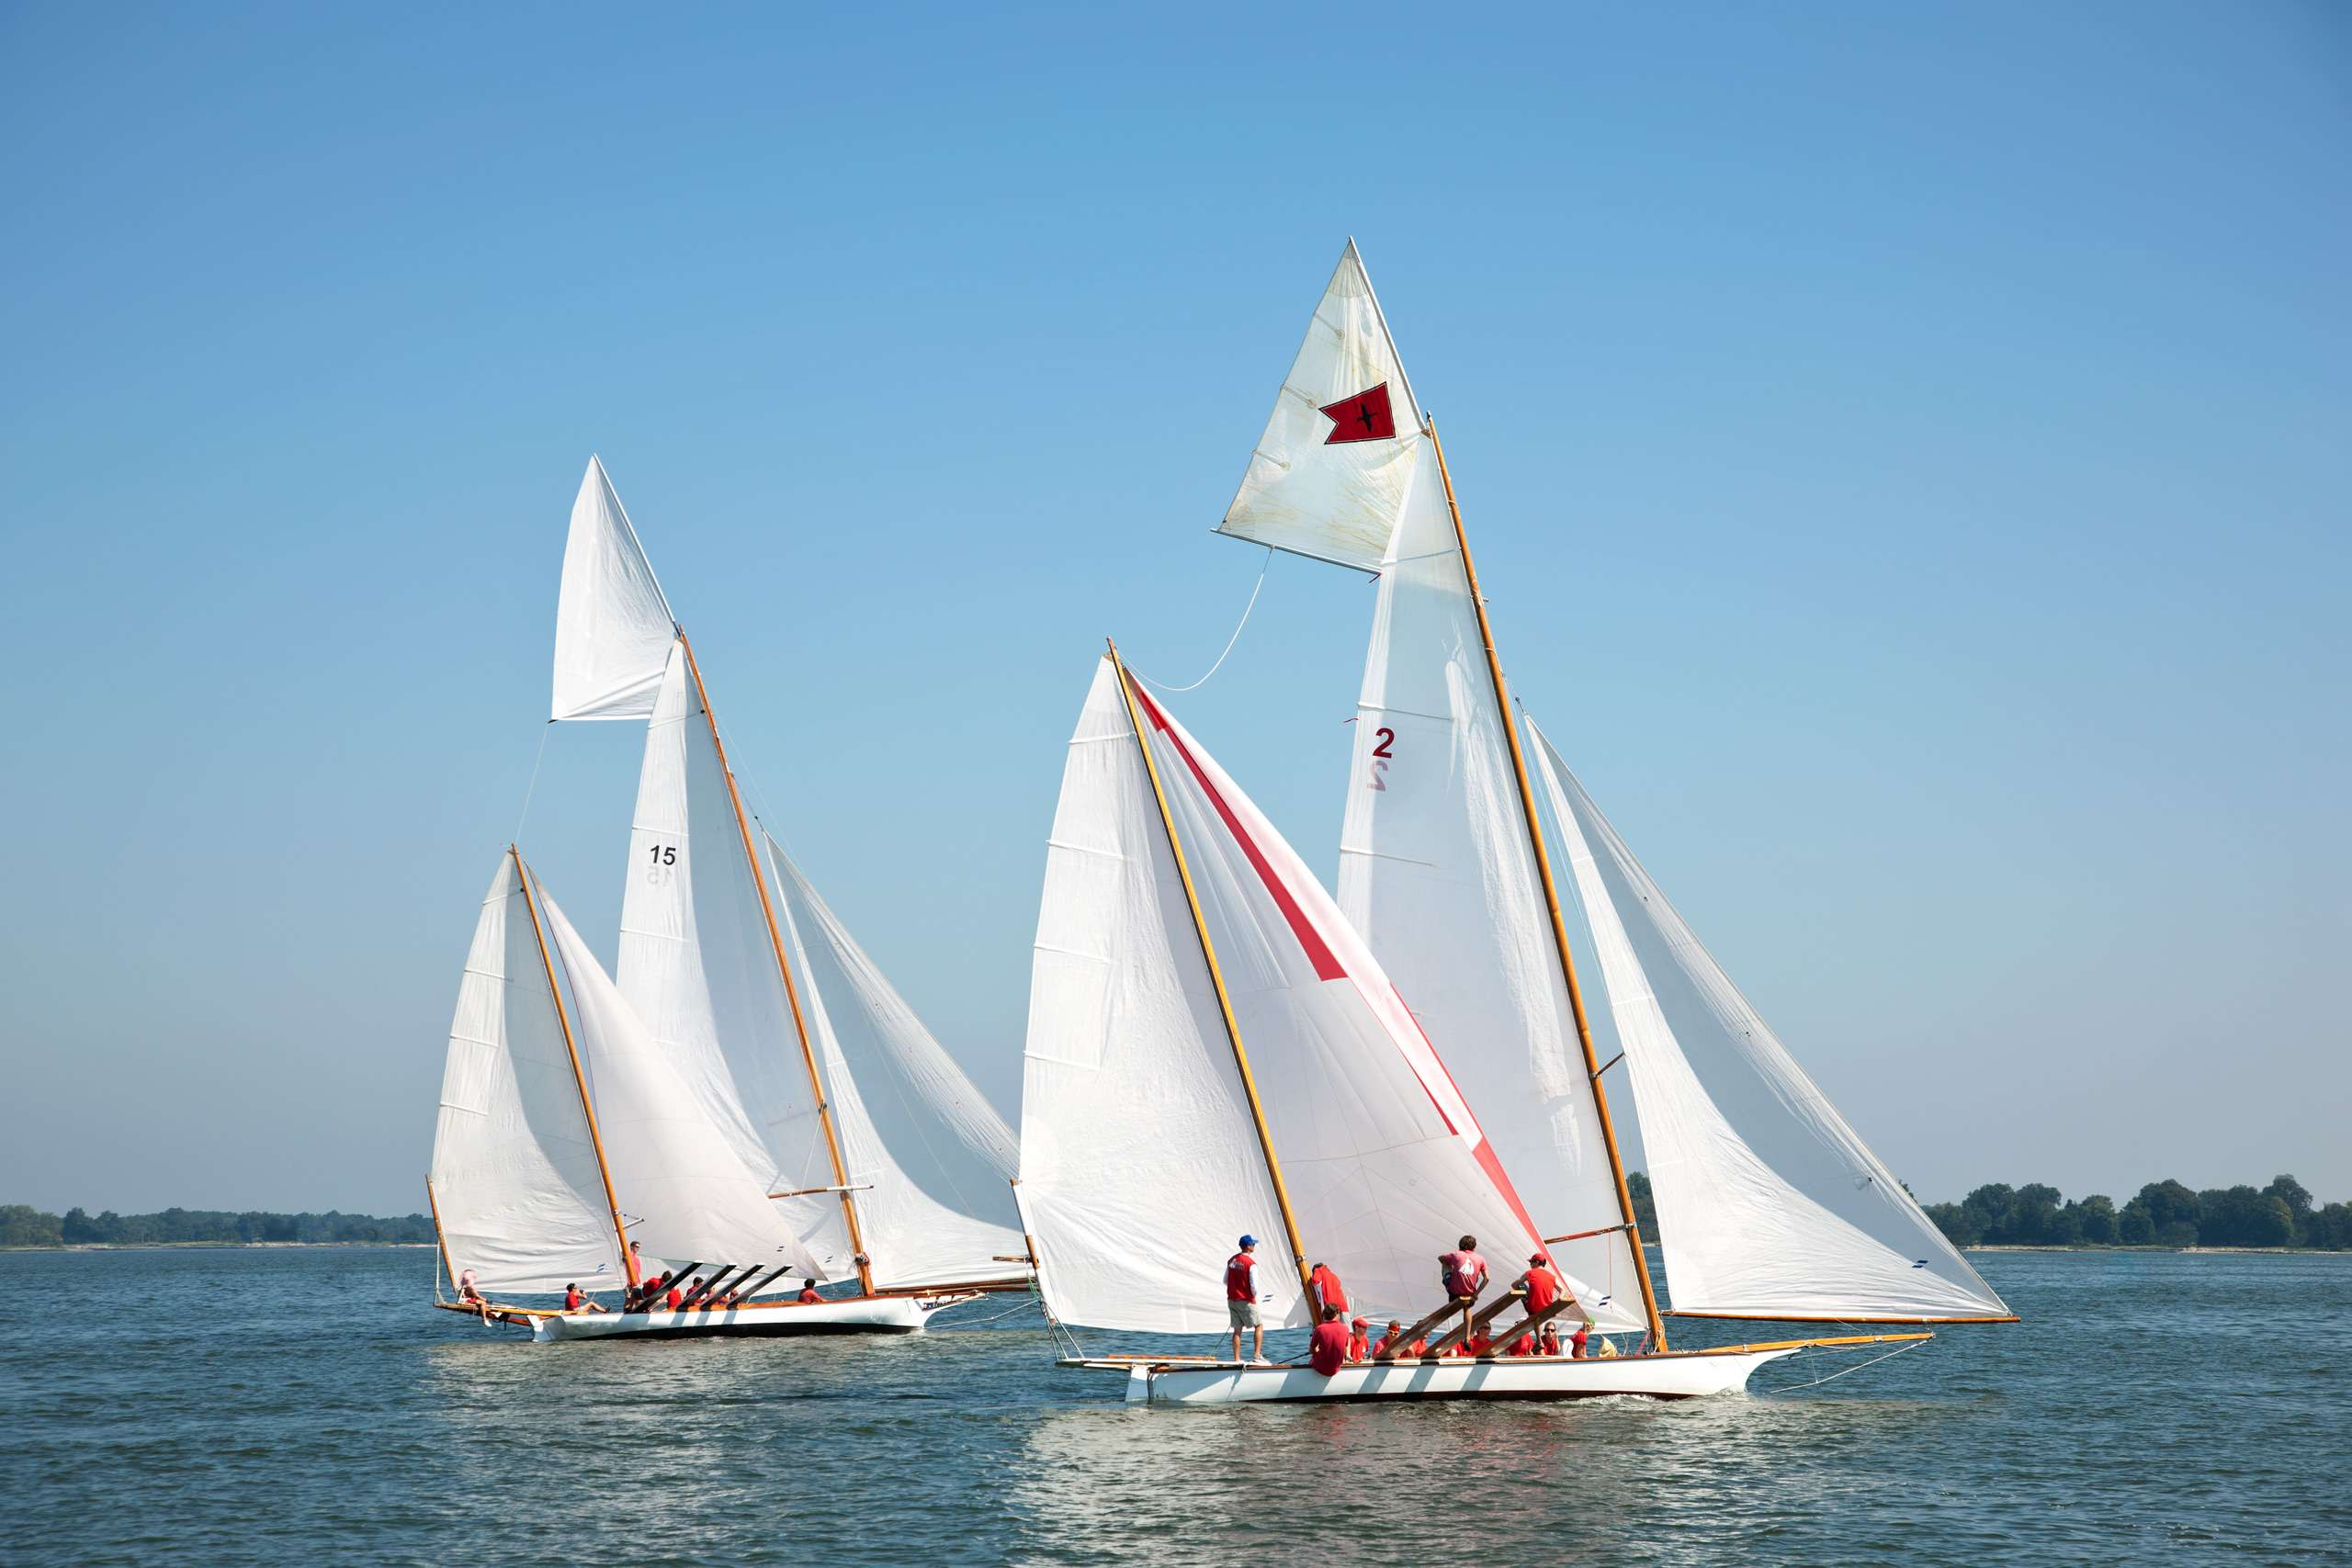 PORTFOLIO - Sailing - Log Canoes #20   PCG558